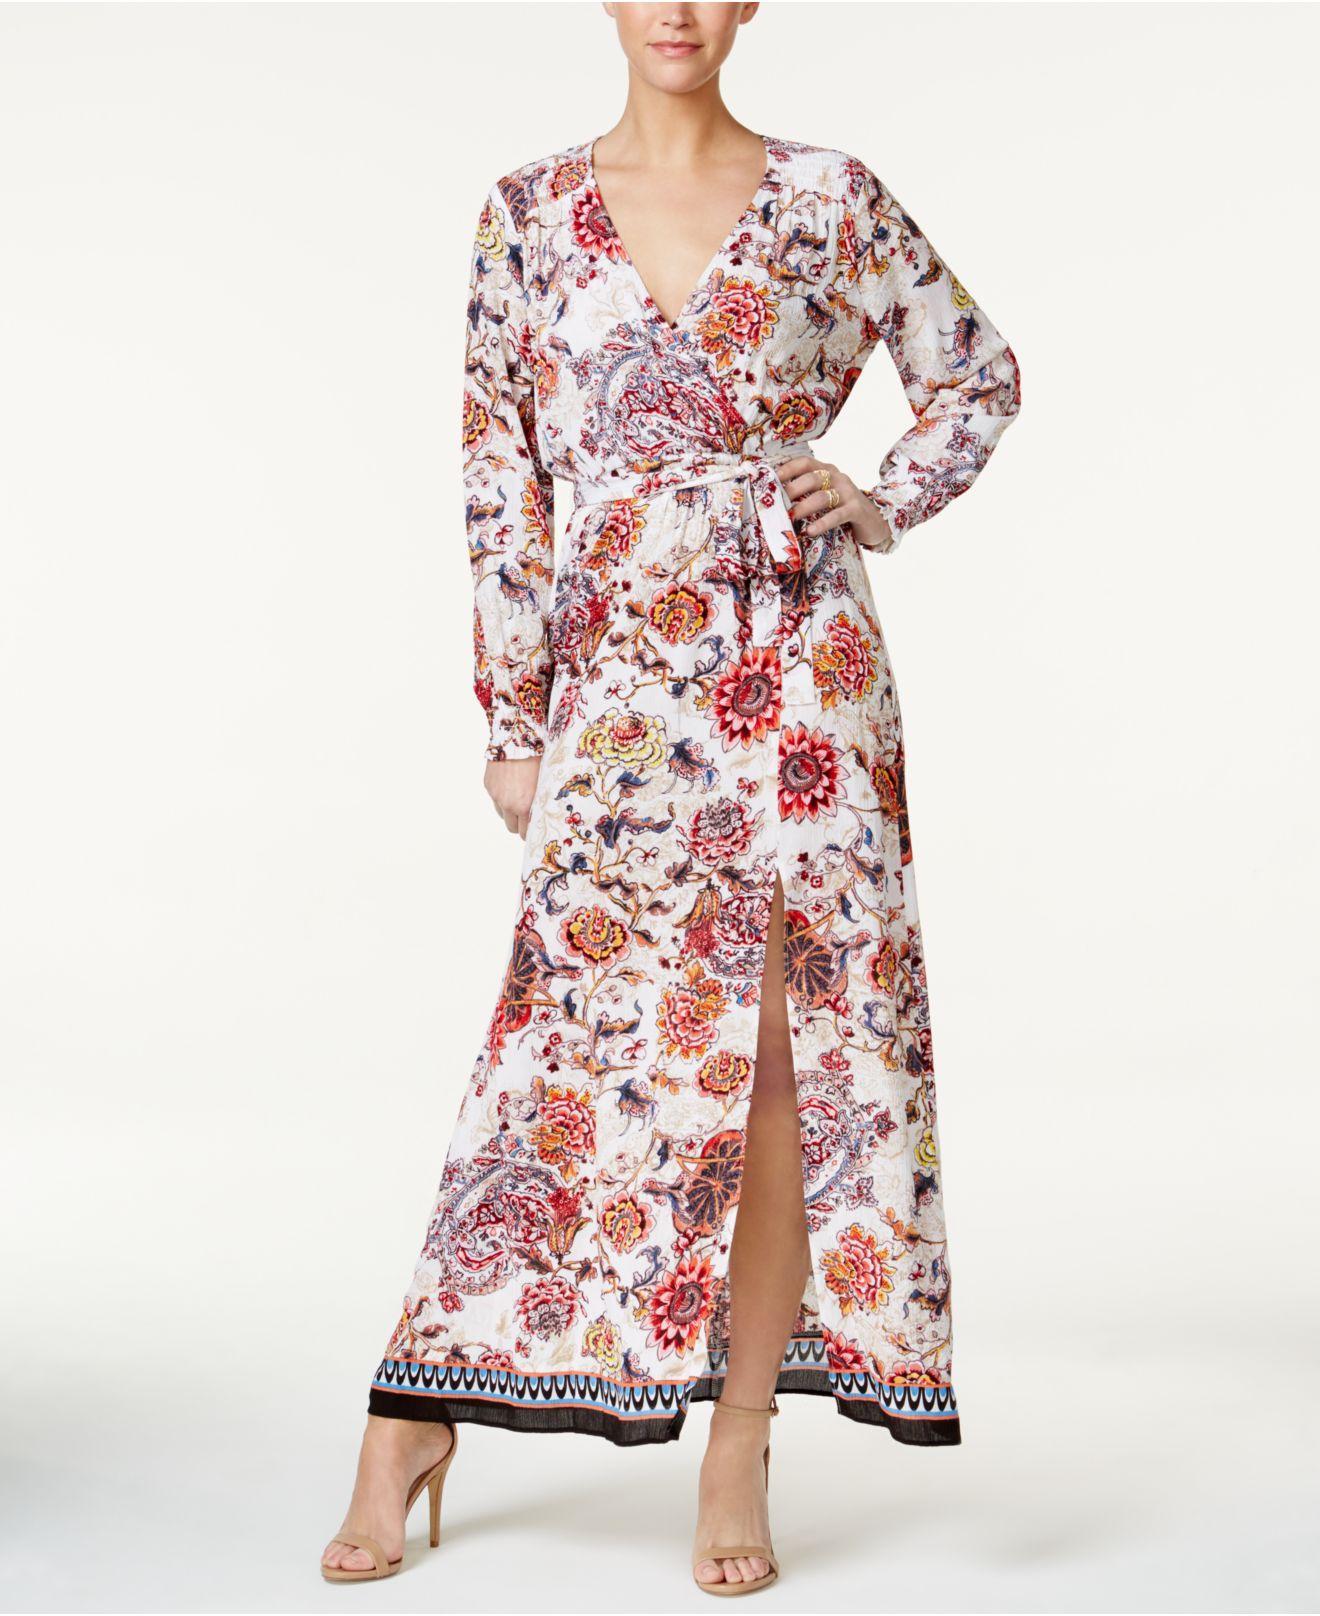 01c21770c Lyst - Eci Mixed-print Faux-wrap Maxi Dress in Red